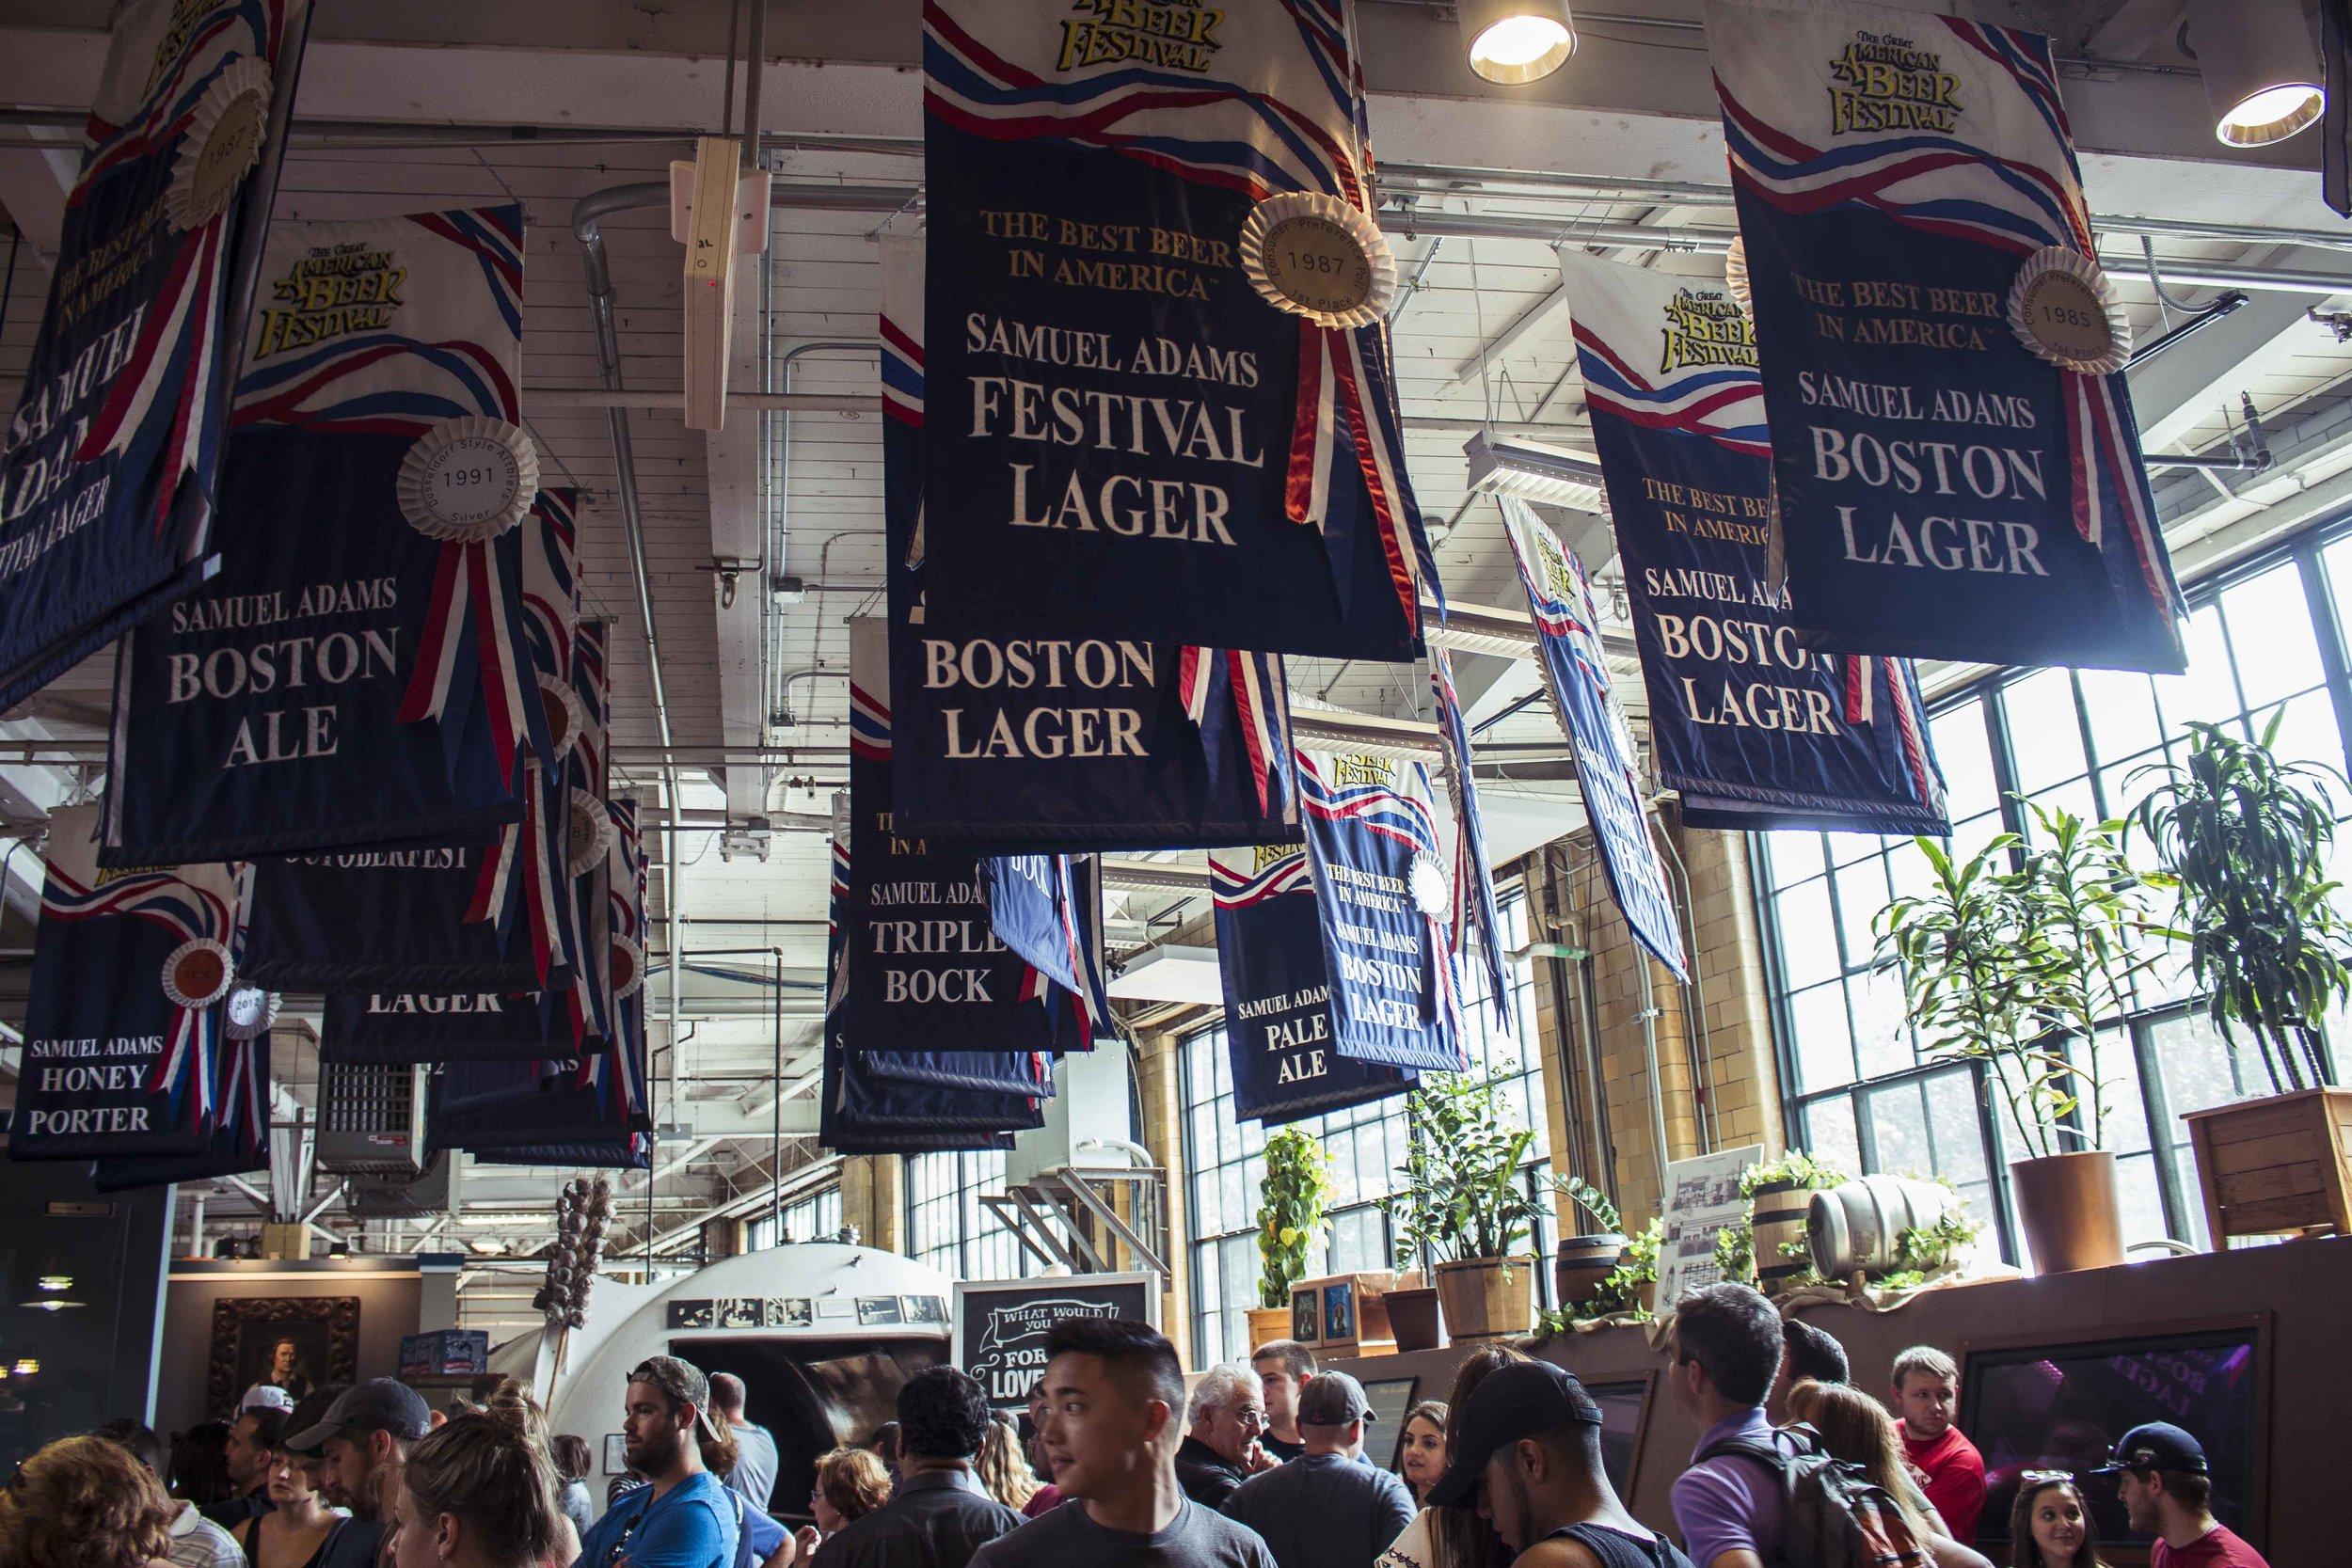 Sam Adam's Brewery, 2016